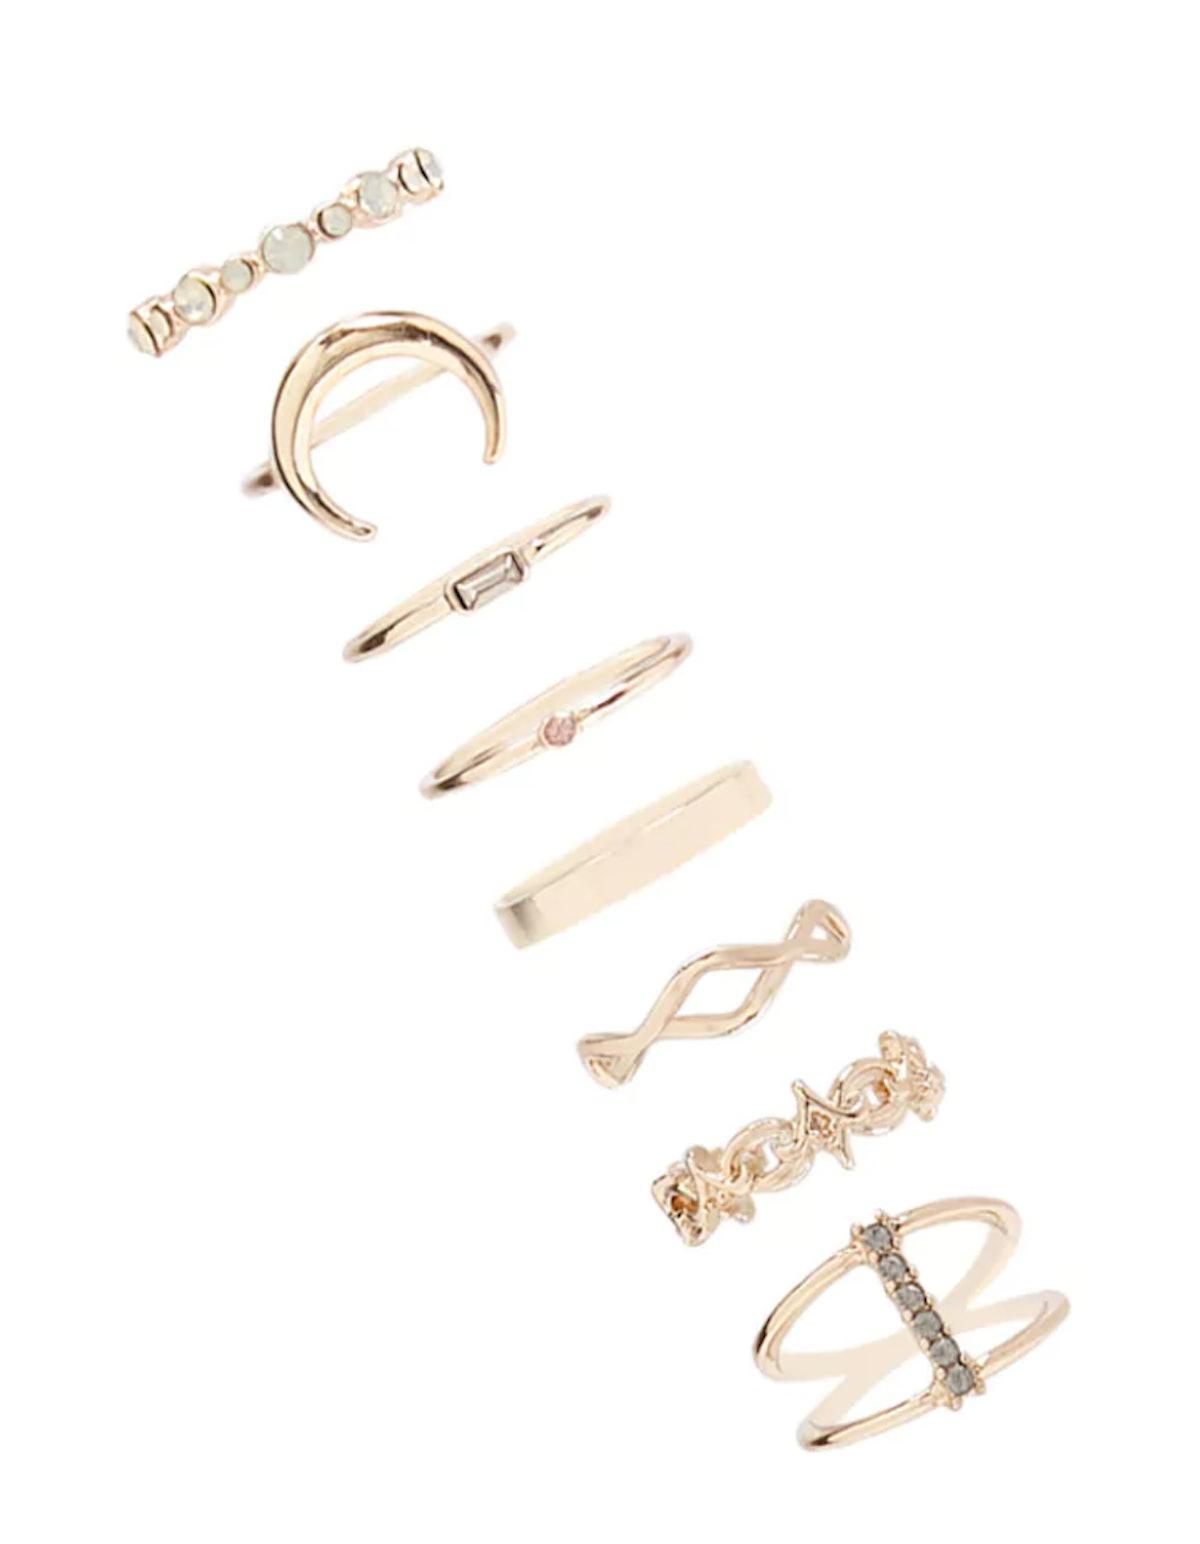 Rhinestone Stackable Ring Set